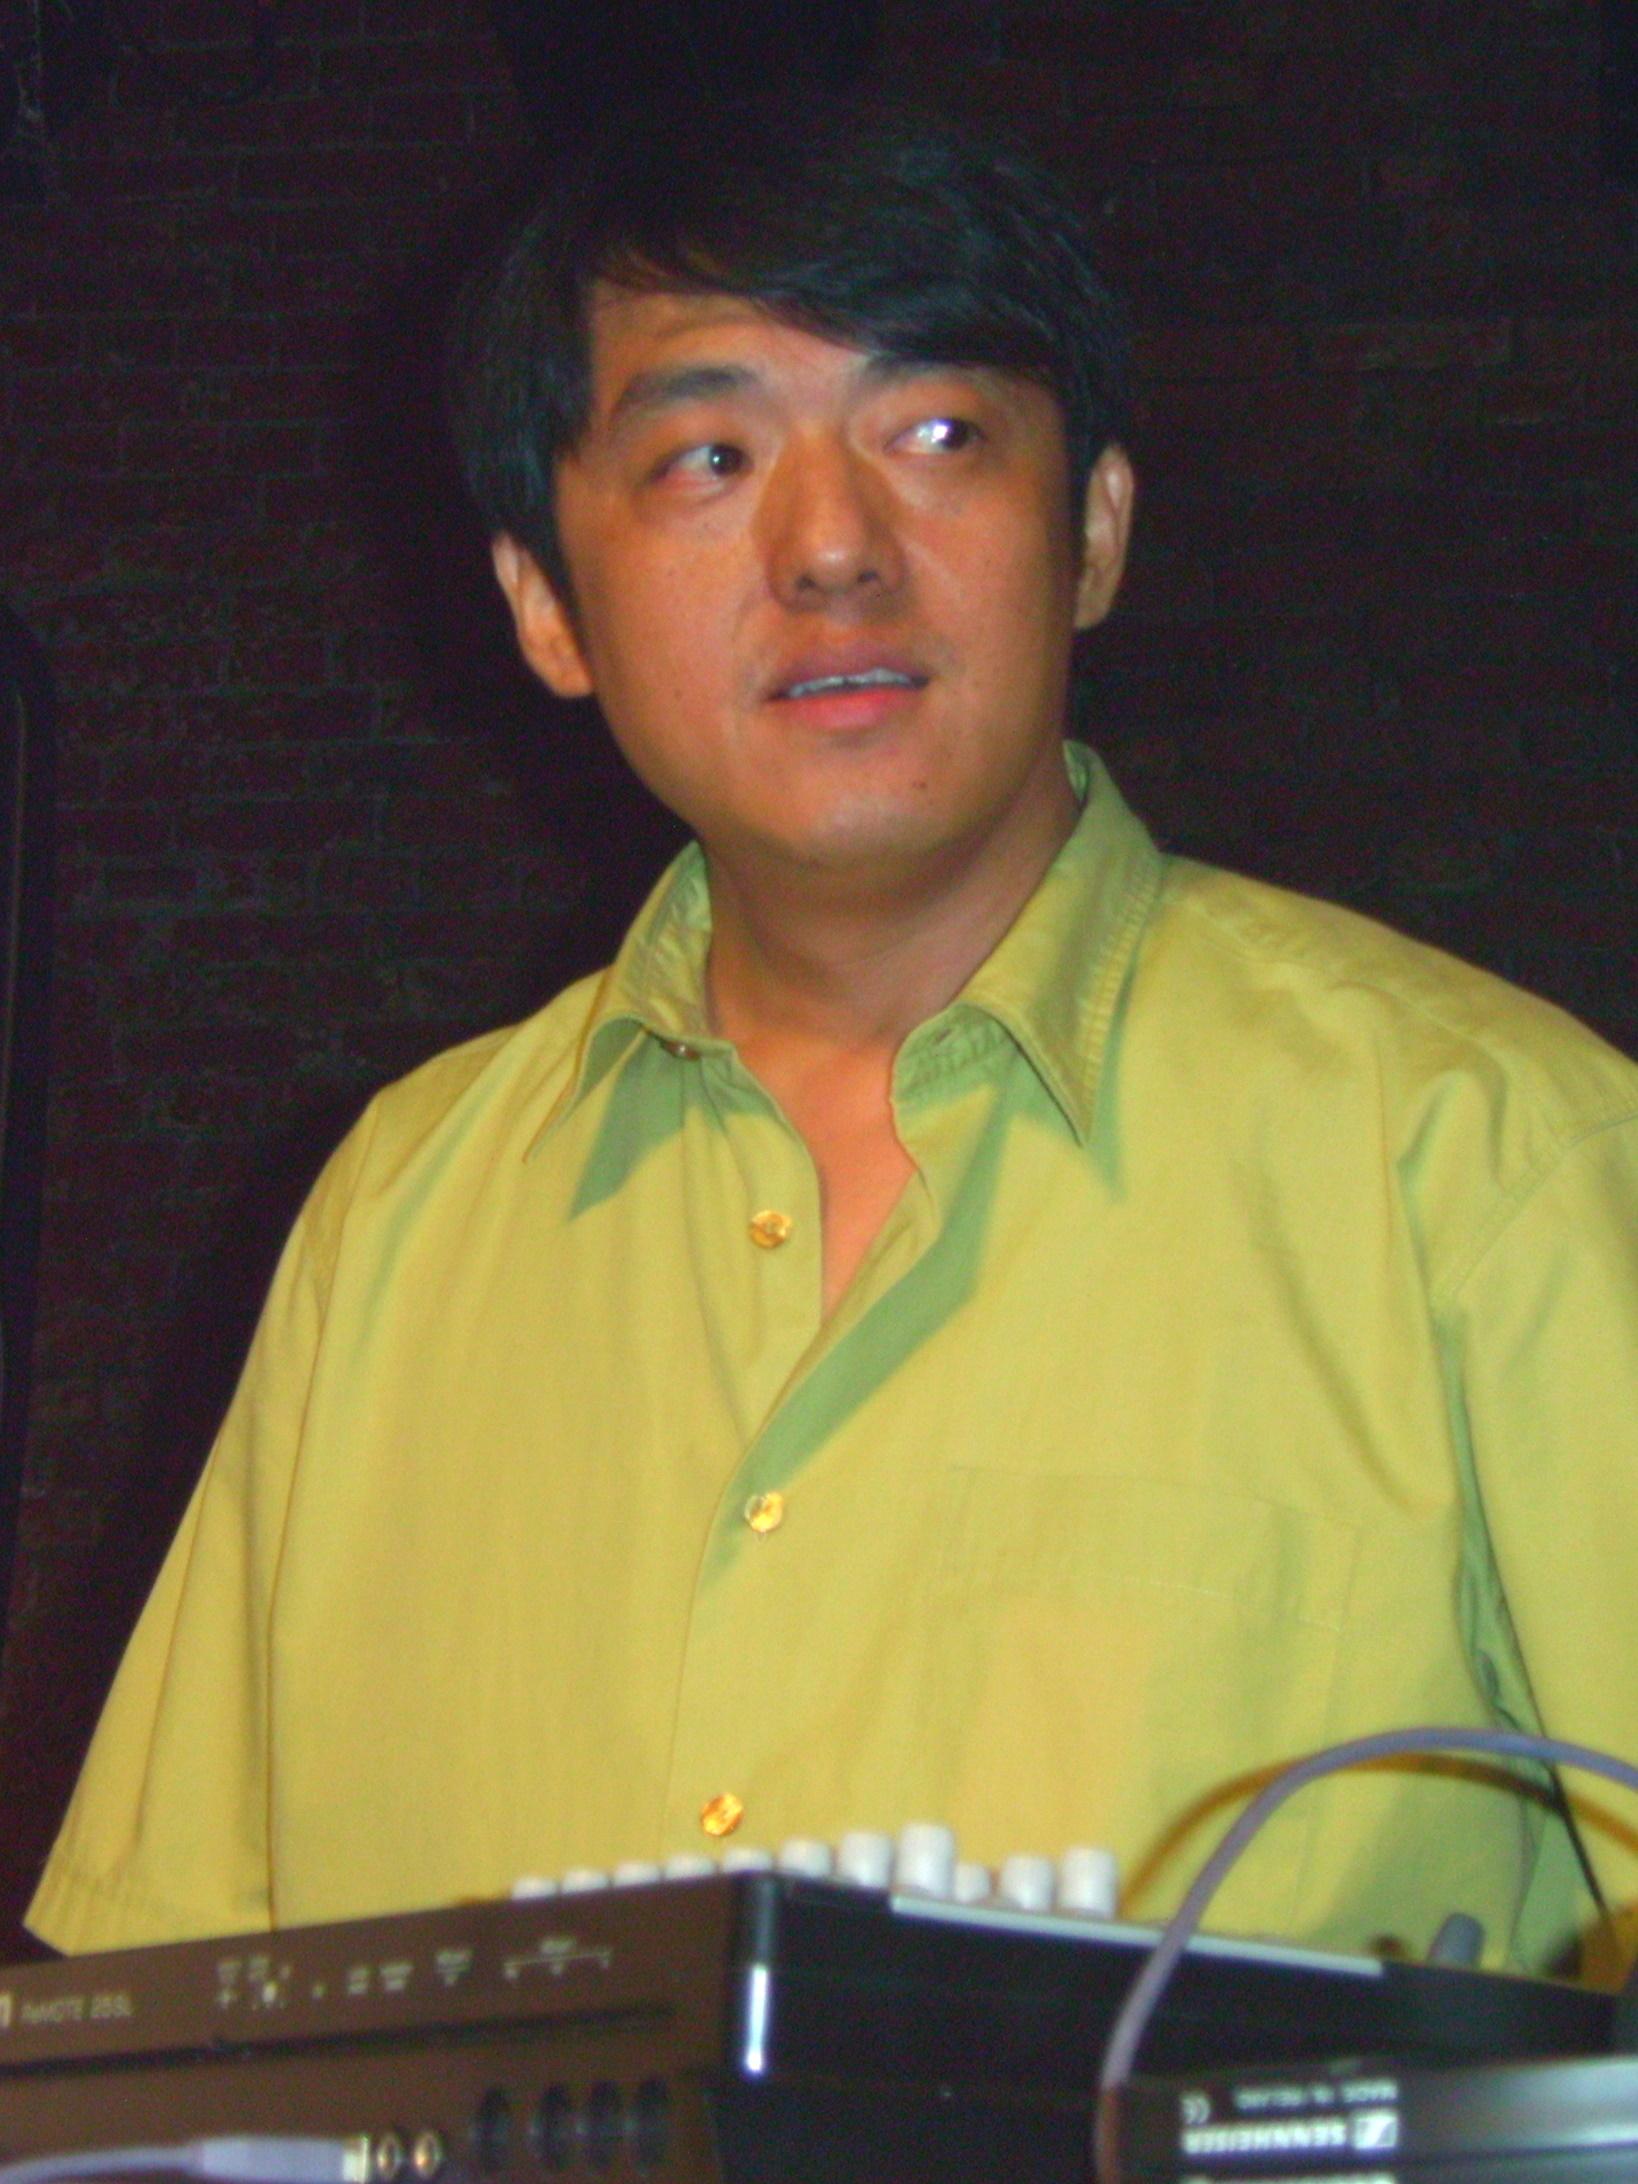 Photo Giong Lim via Opendata BNF